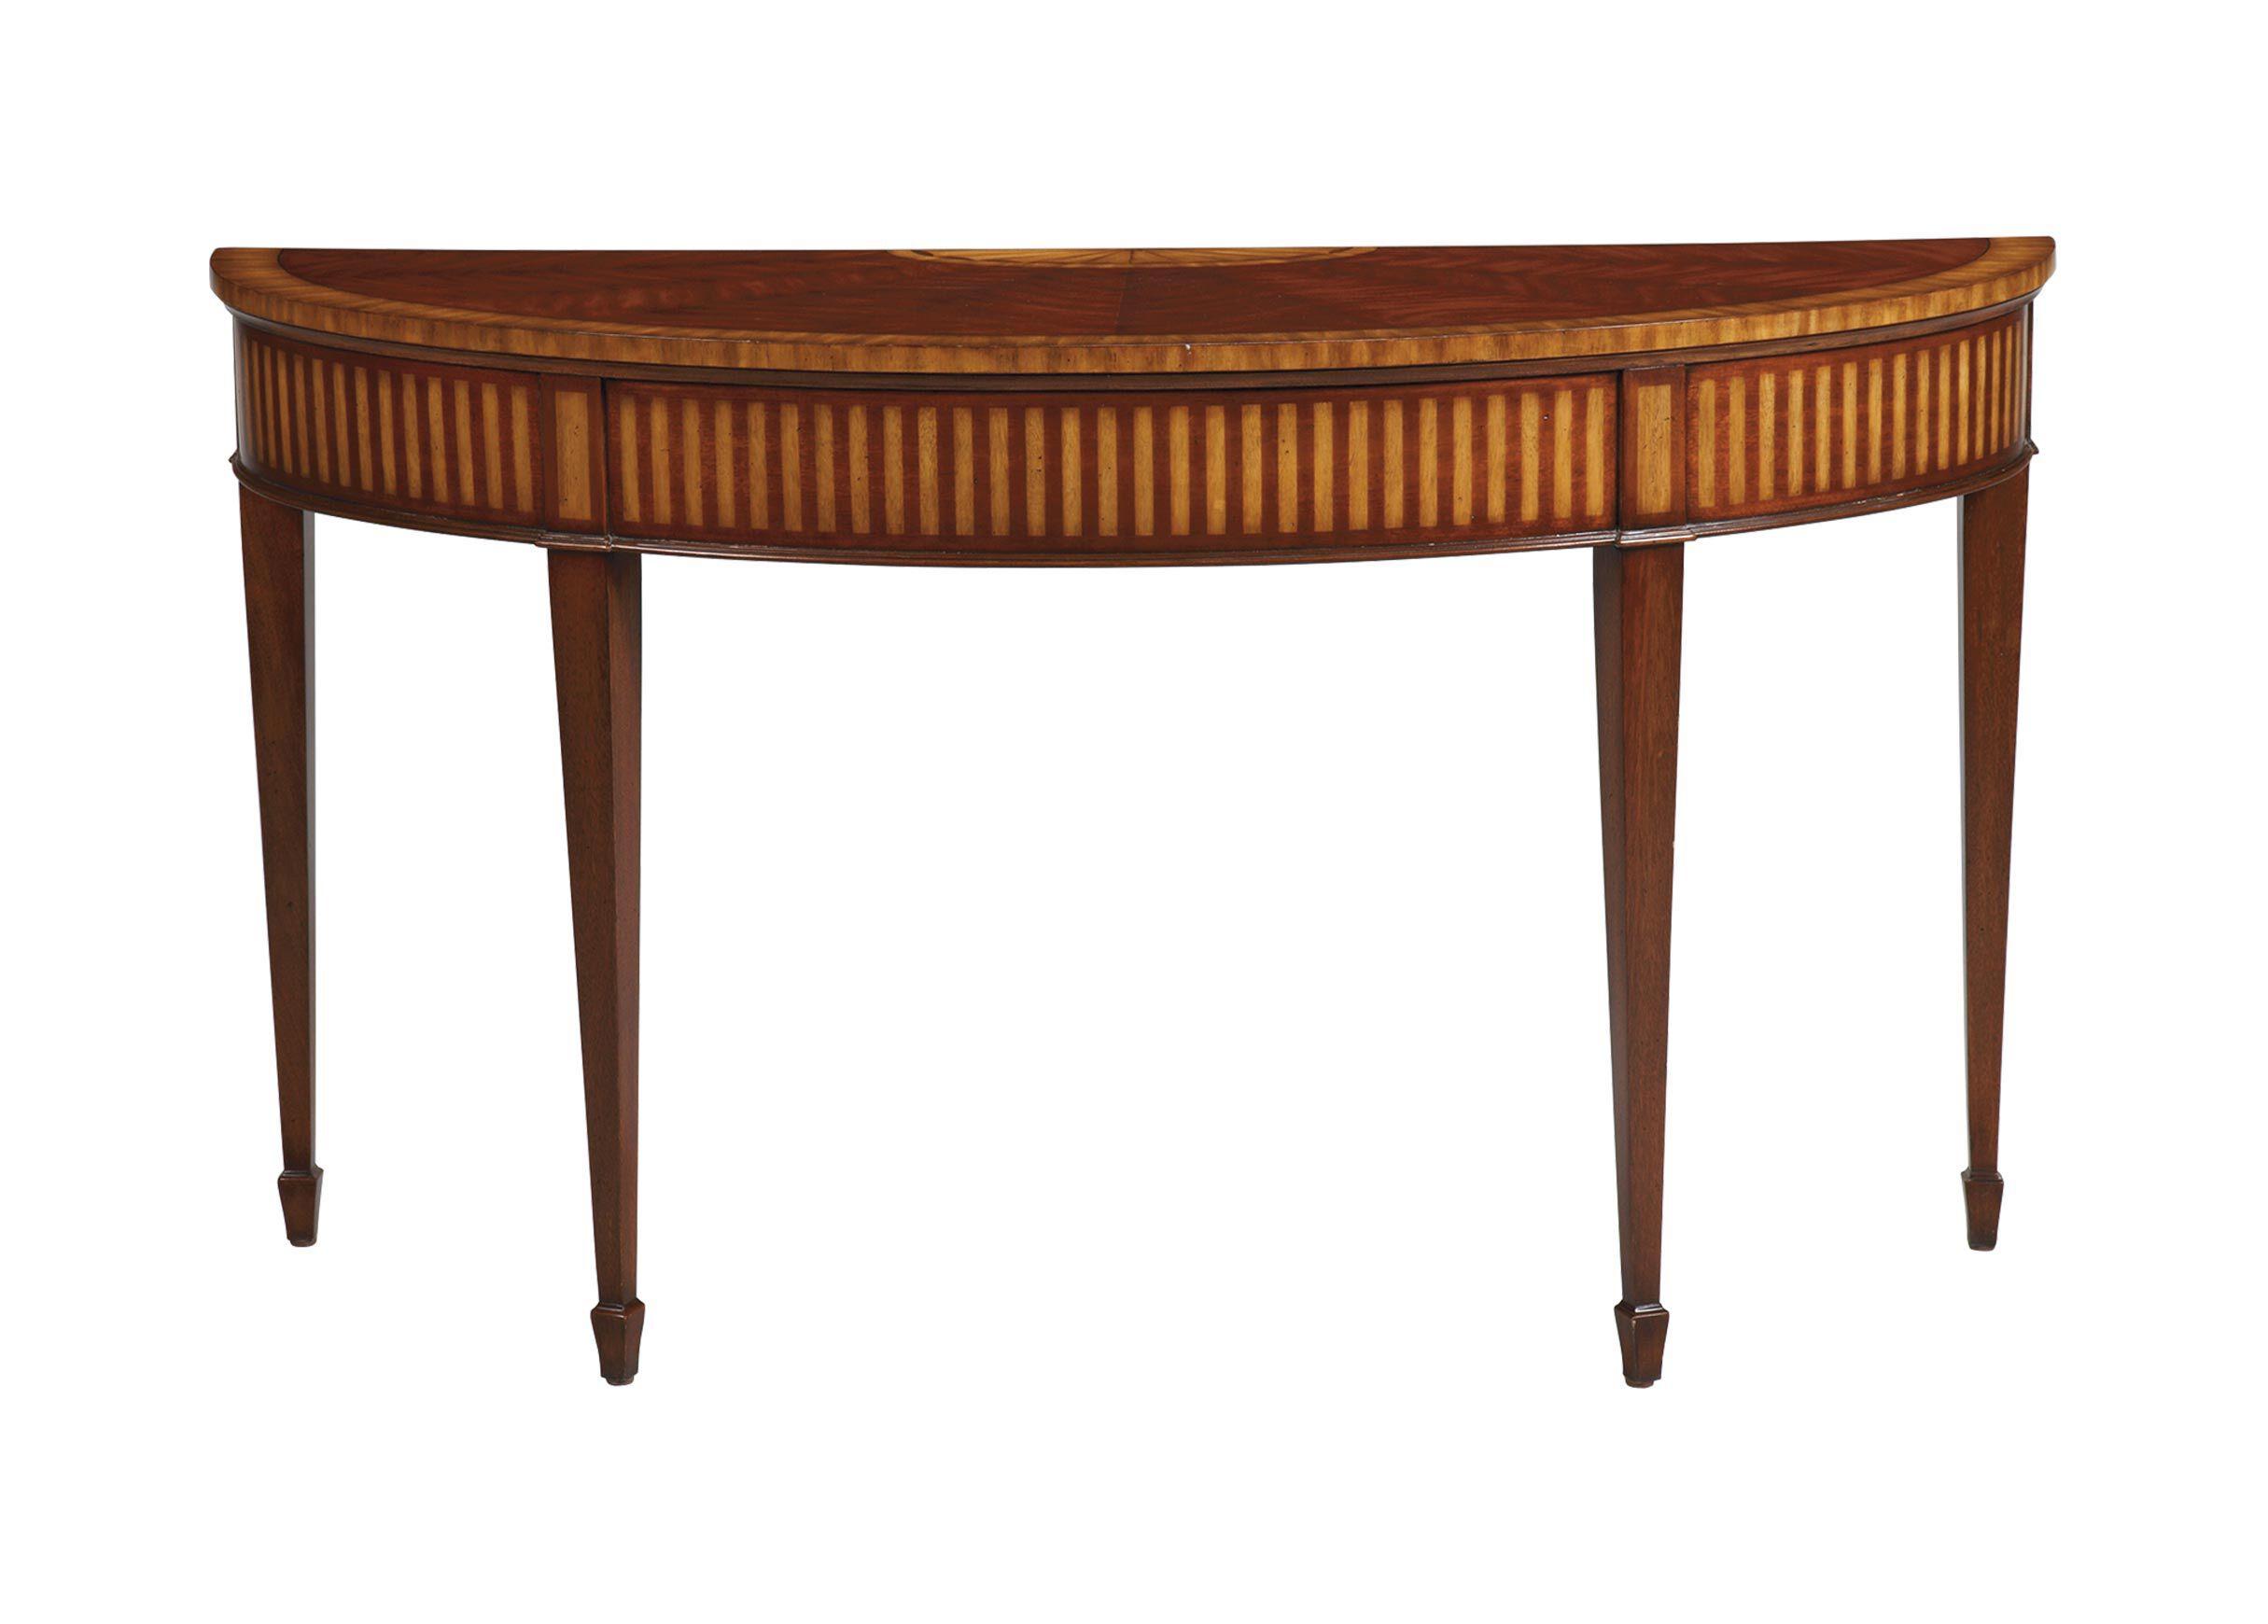 renate gray sofa table de sede gebraucht kaufen newman demilune console tables